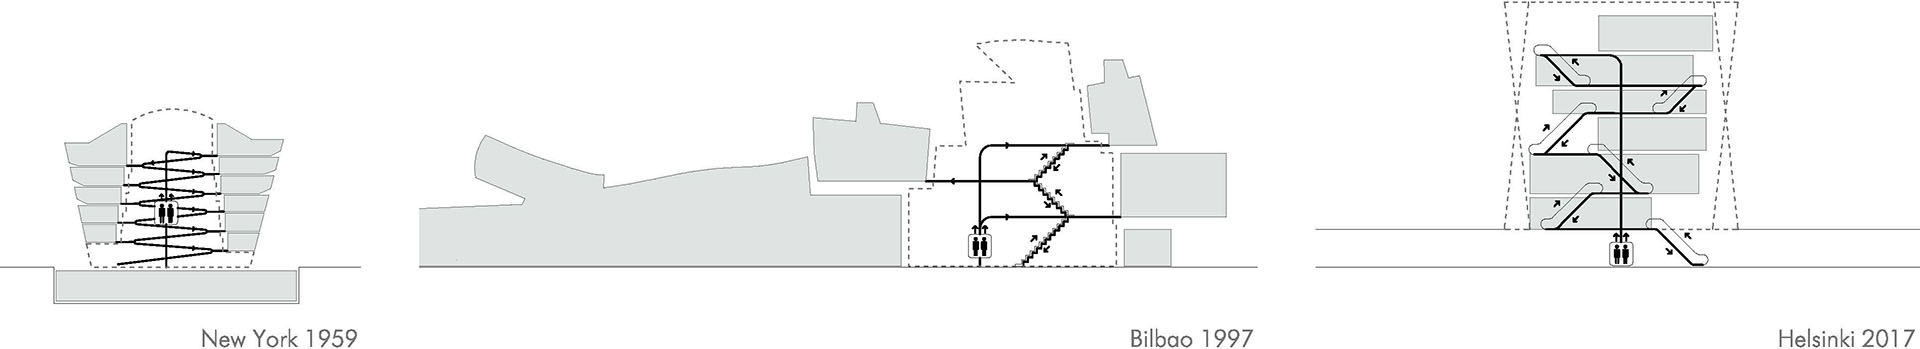 PLAYstudio_Guggenheim-Helsinki_Diagrama (3)